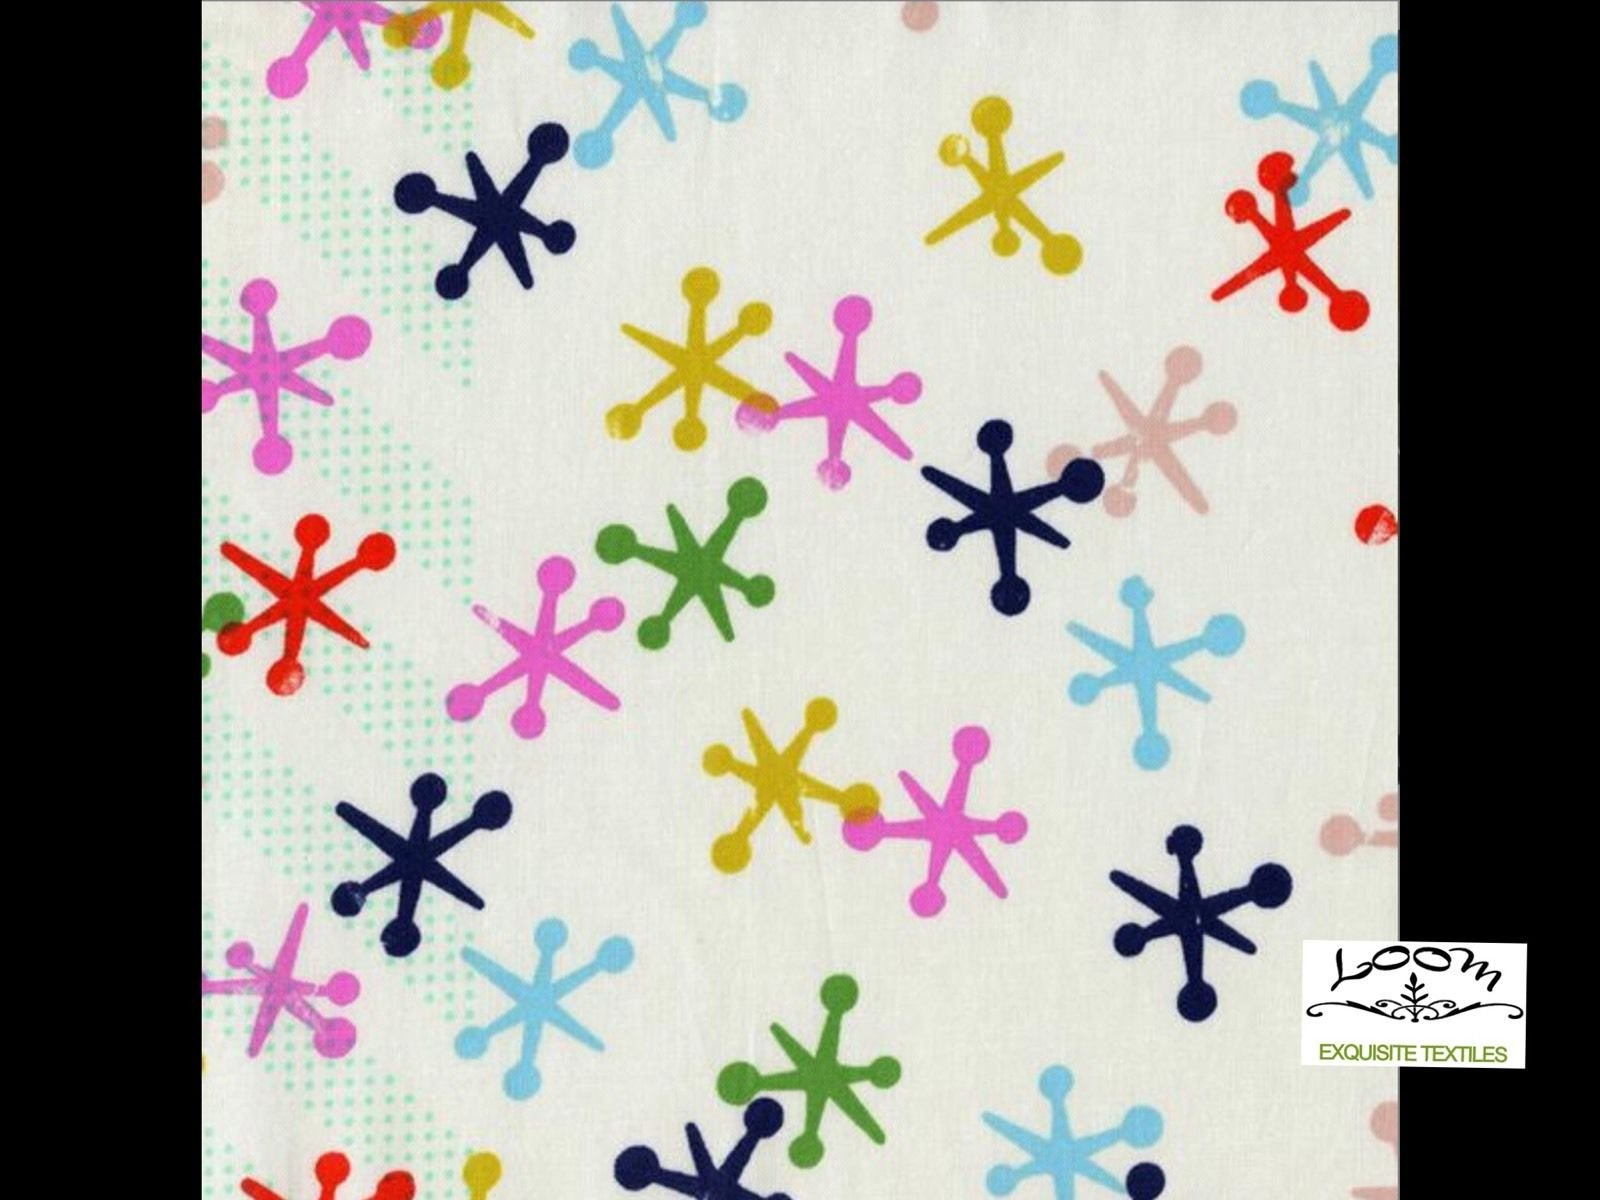 Cotton + Steel Miller Jacks Retro Mod Playful Games Cotton Quilting Fabric CTN26